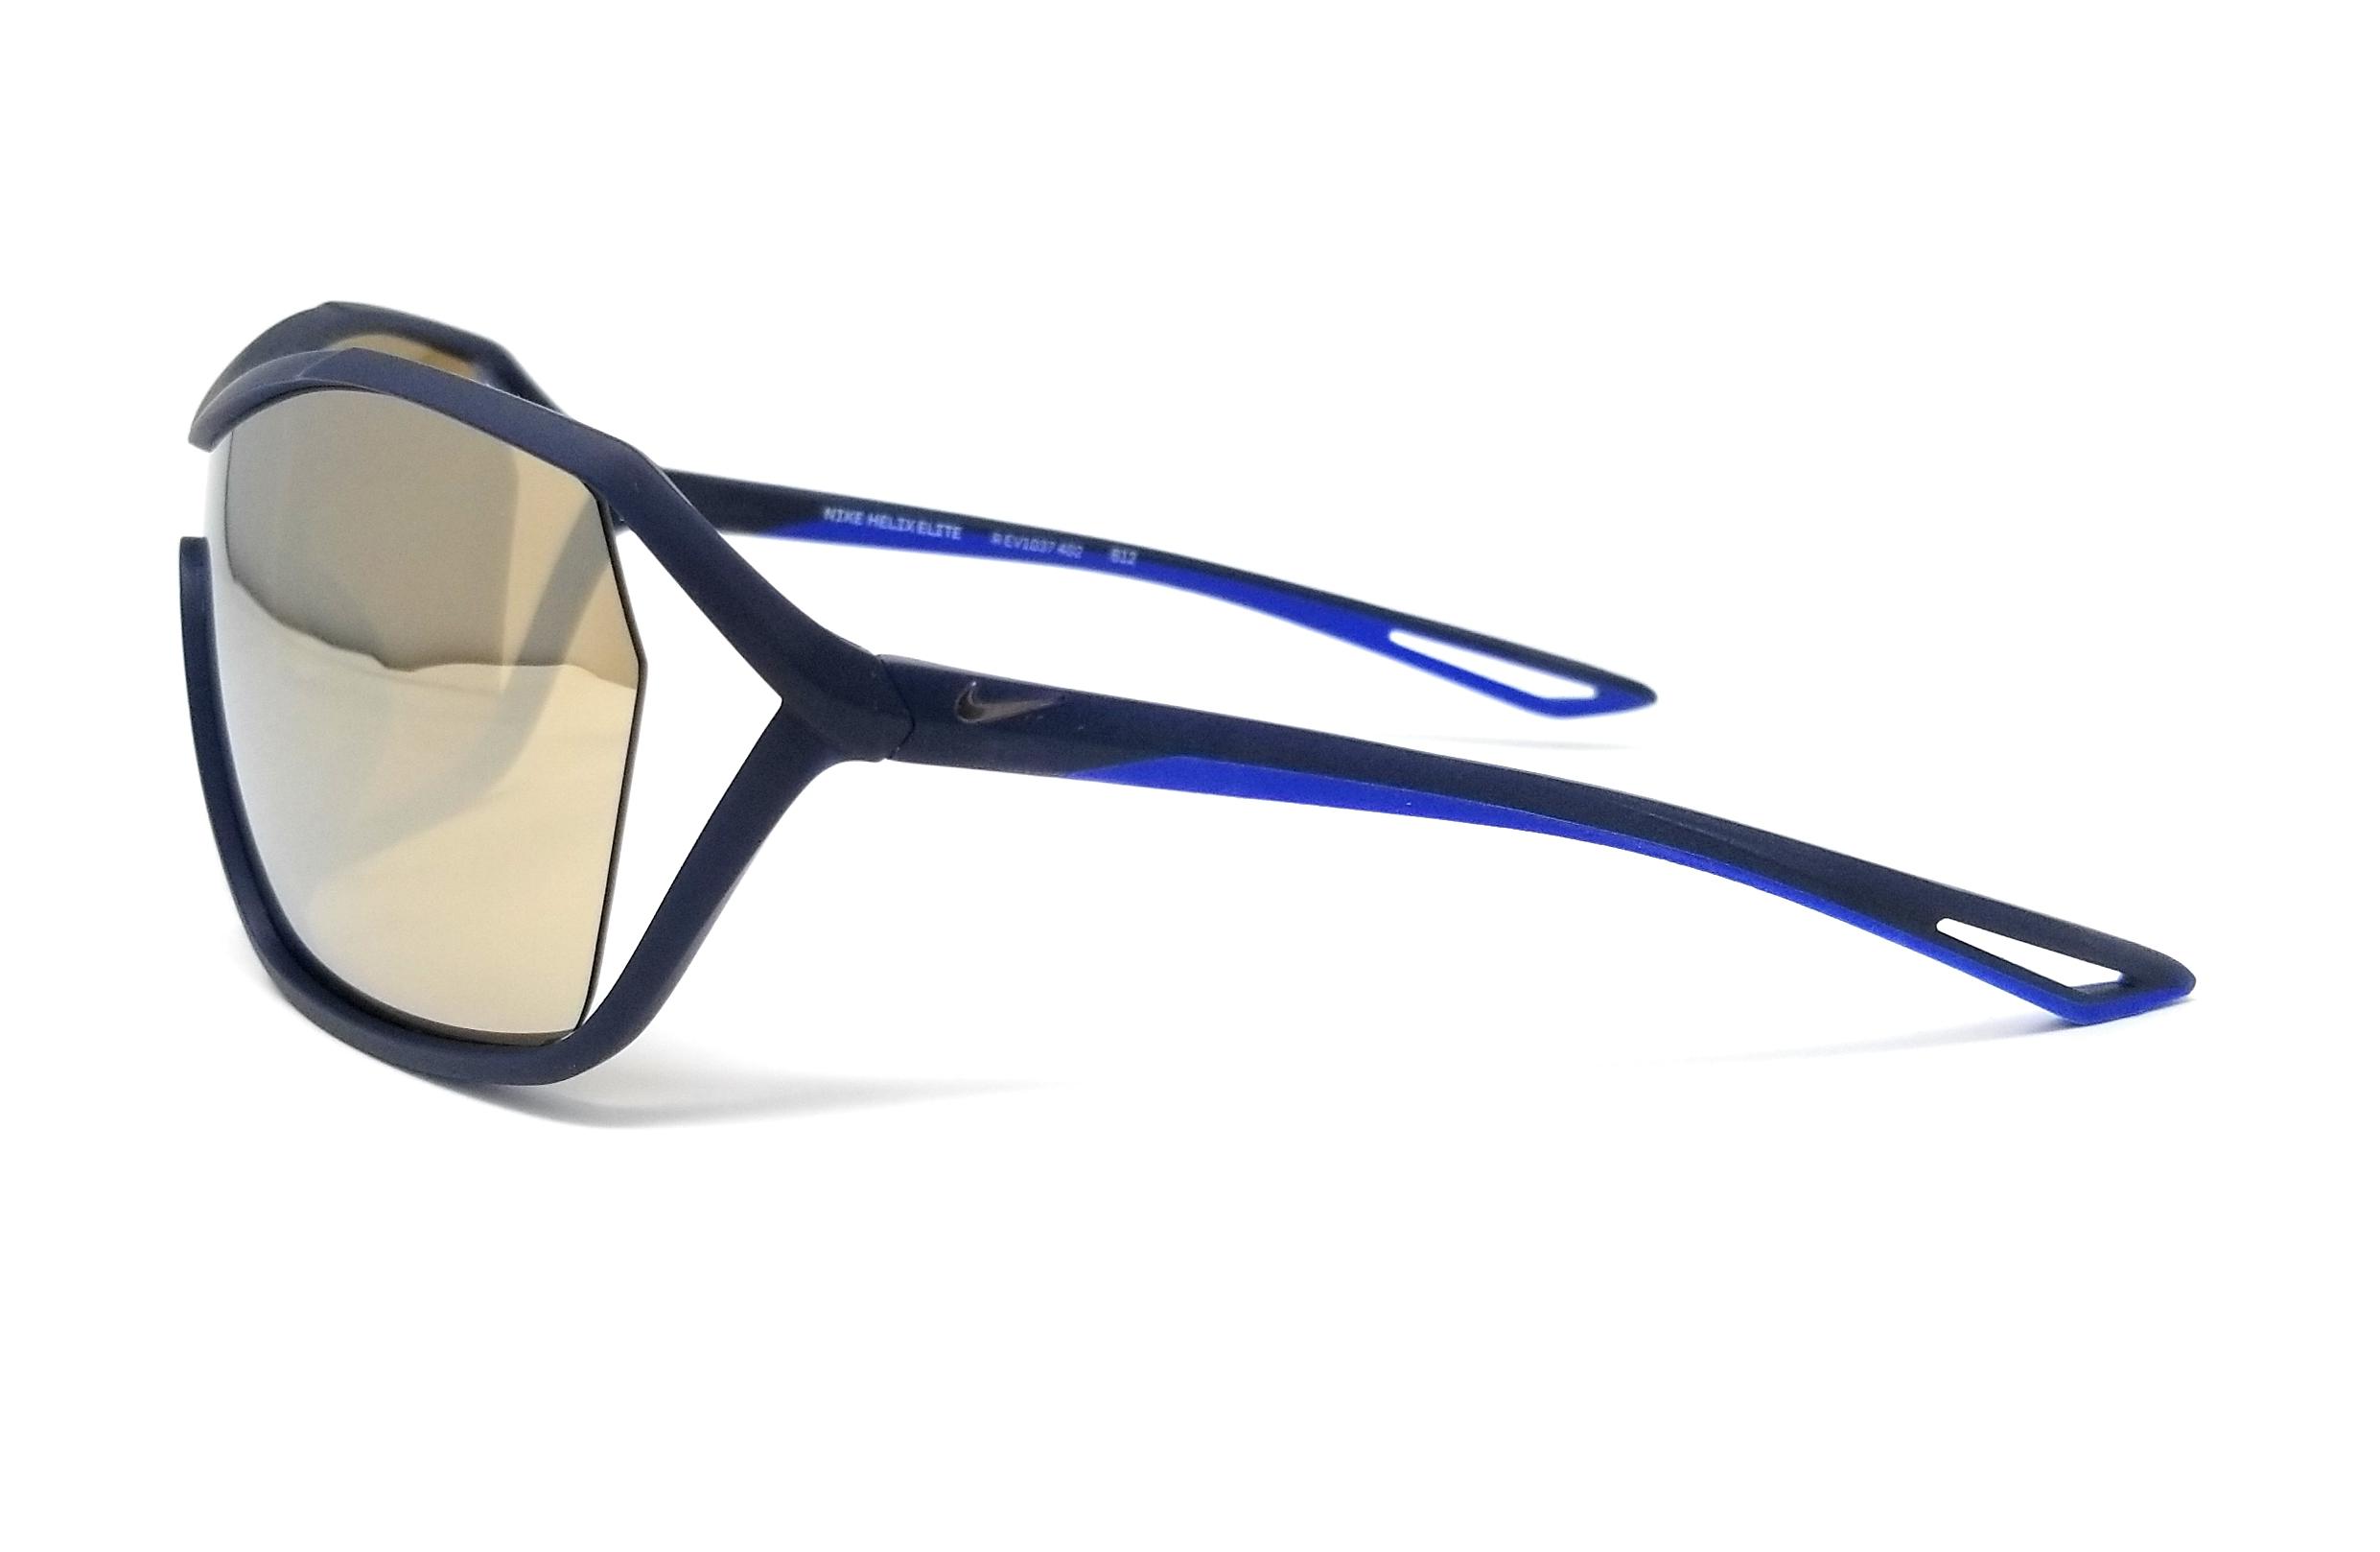 369df320650 NIKE Sunglasses HELIX ELITE M EV1037 402 Obsidian Shield 73x09x120 ...